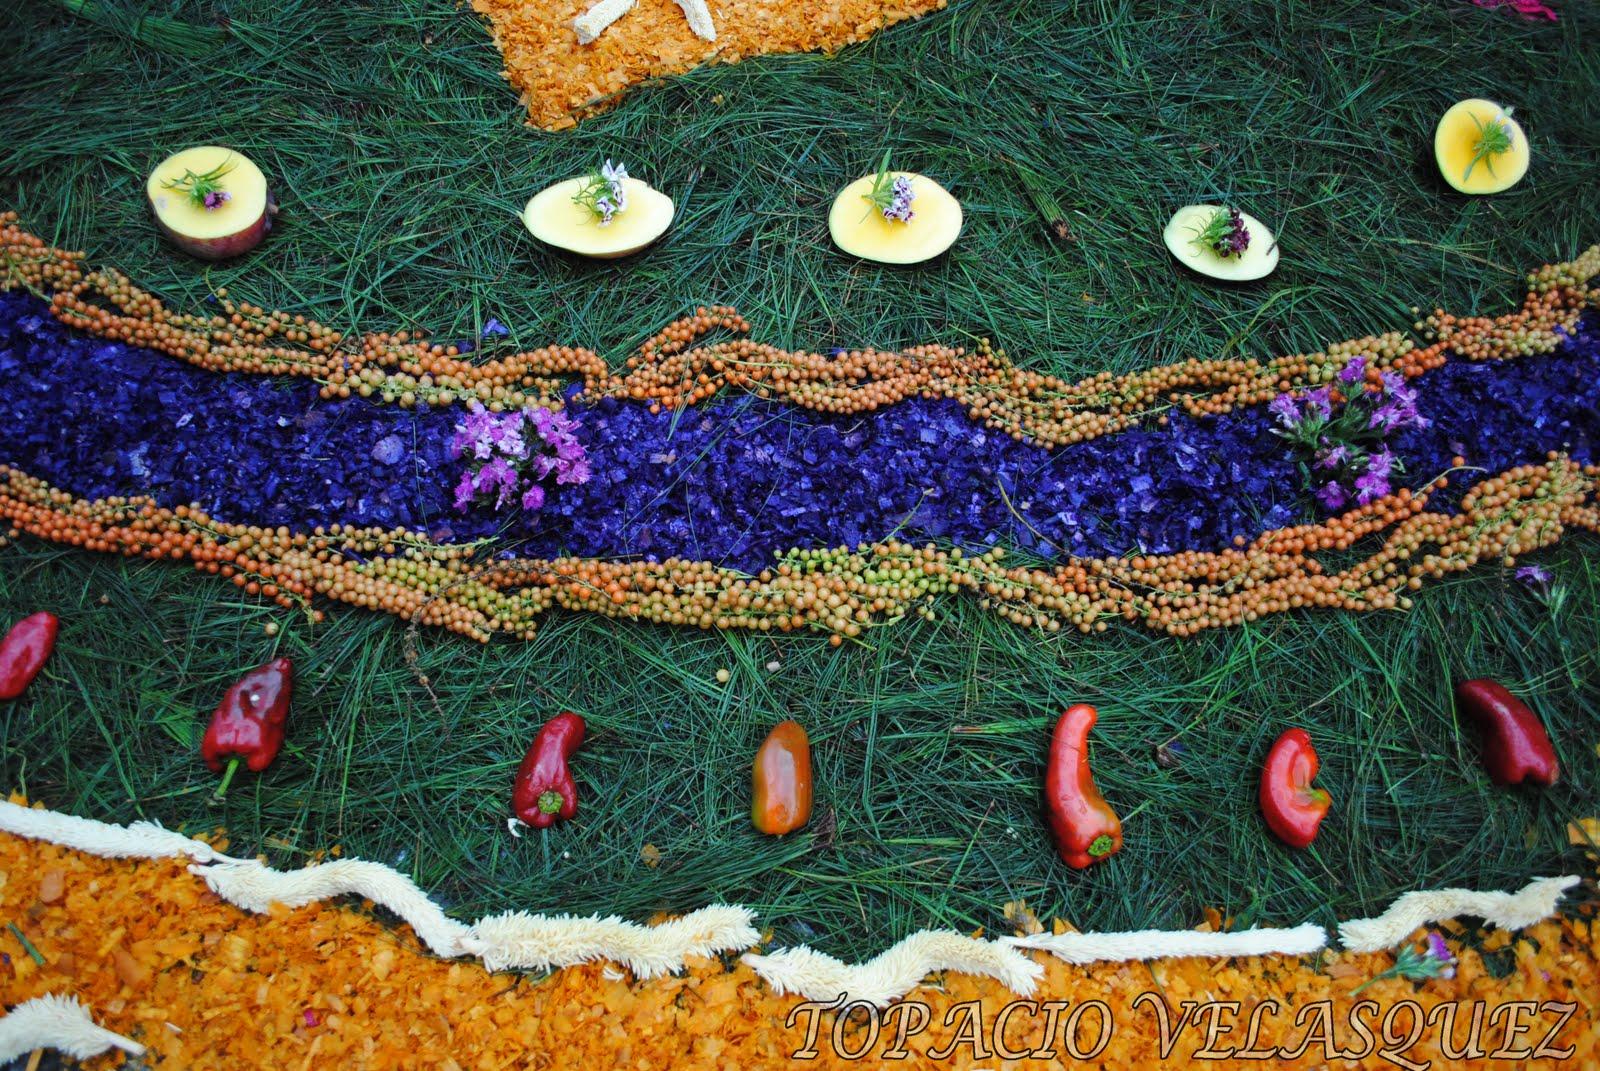 Foto documental alfombras antigua guatemala - La antigua viruta ...